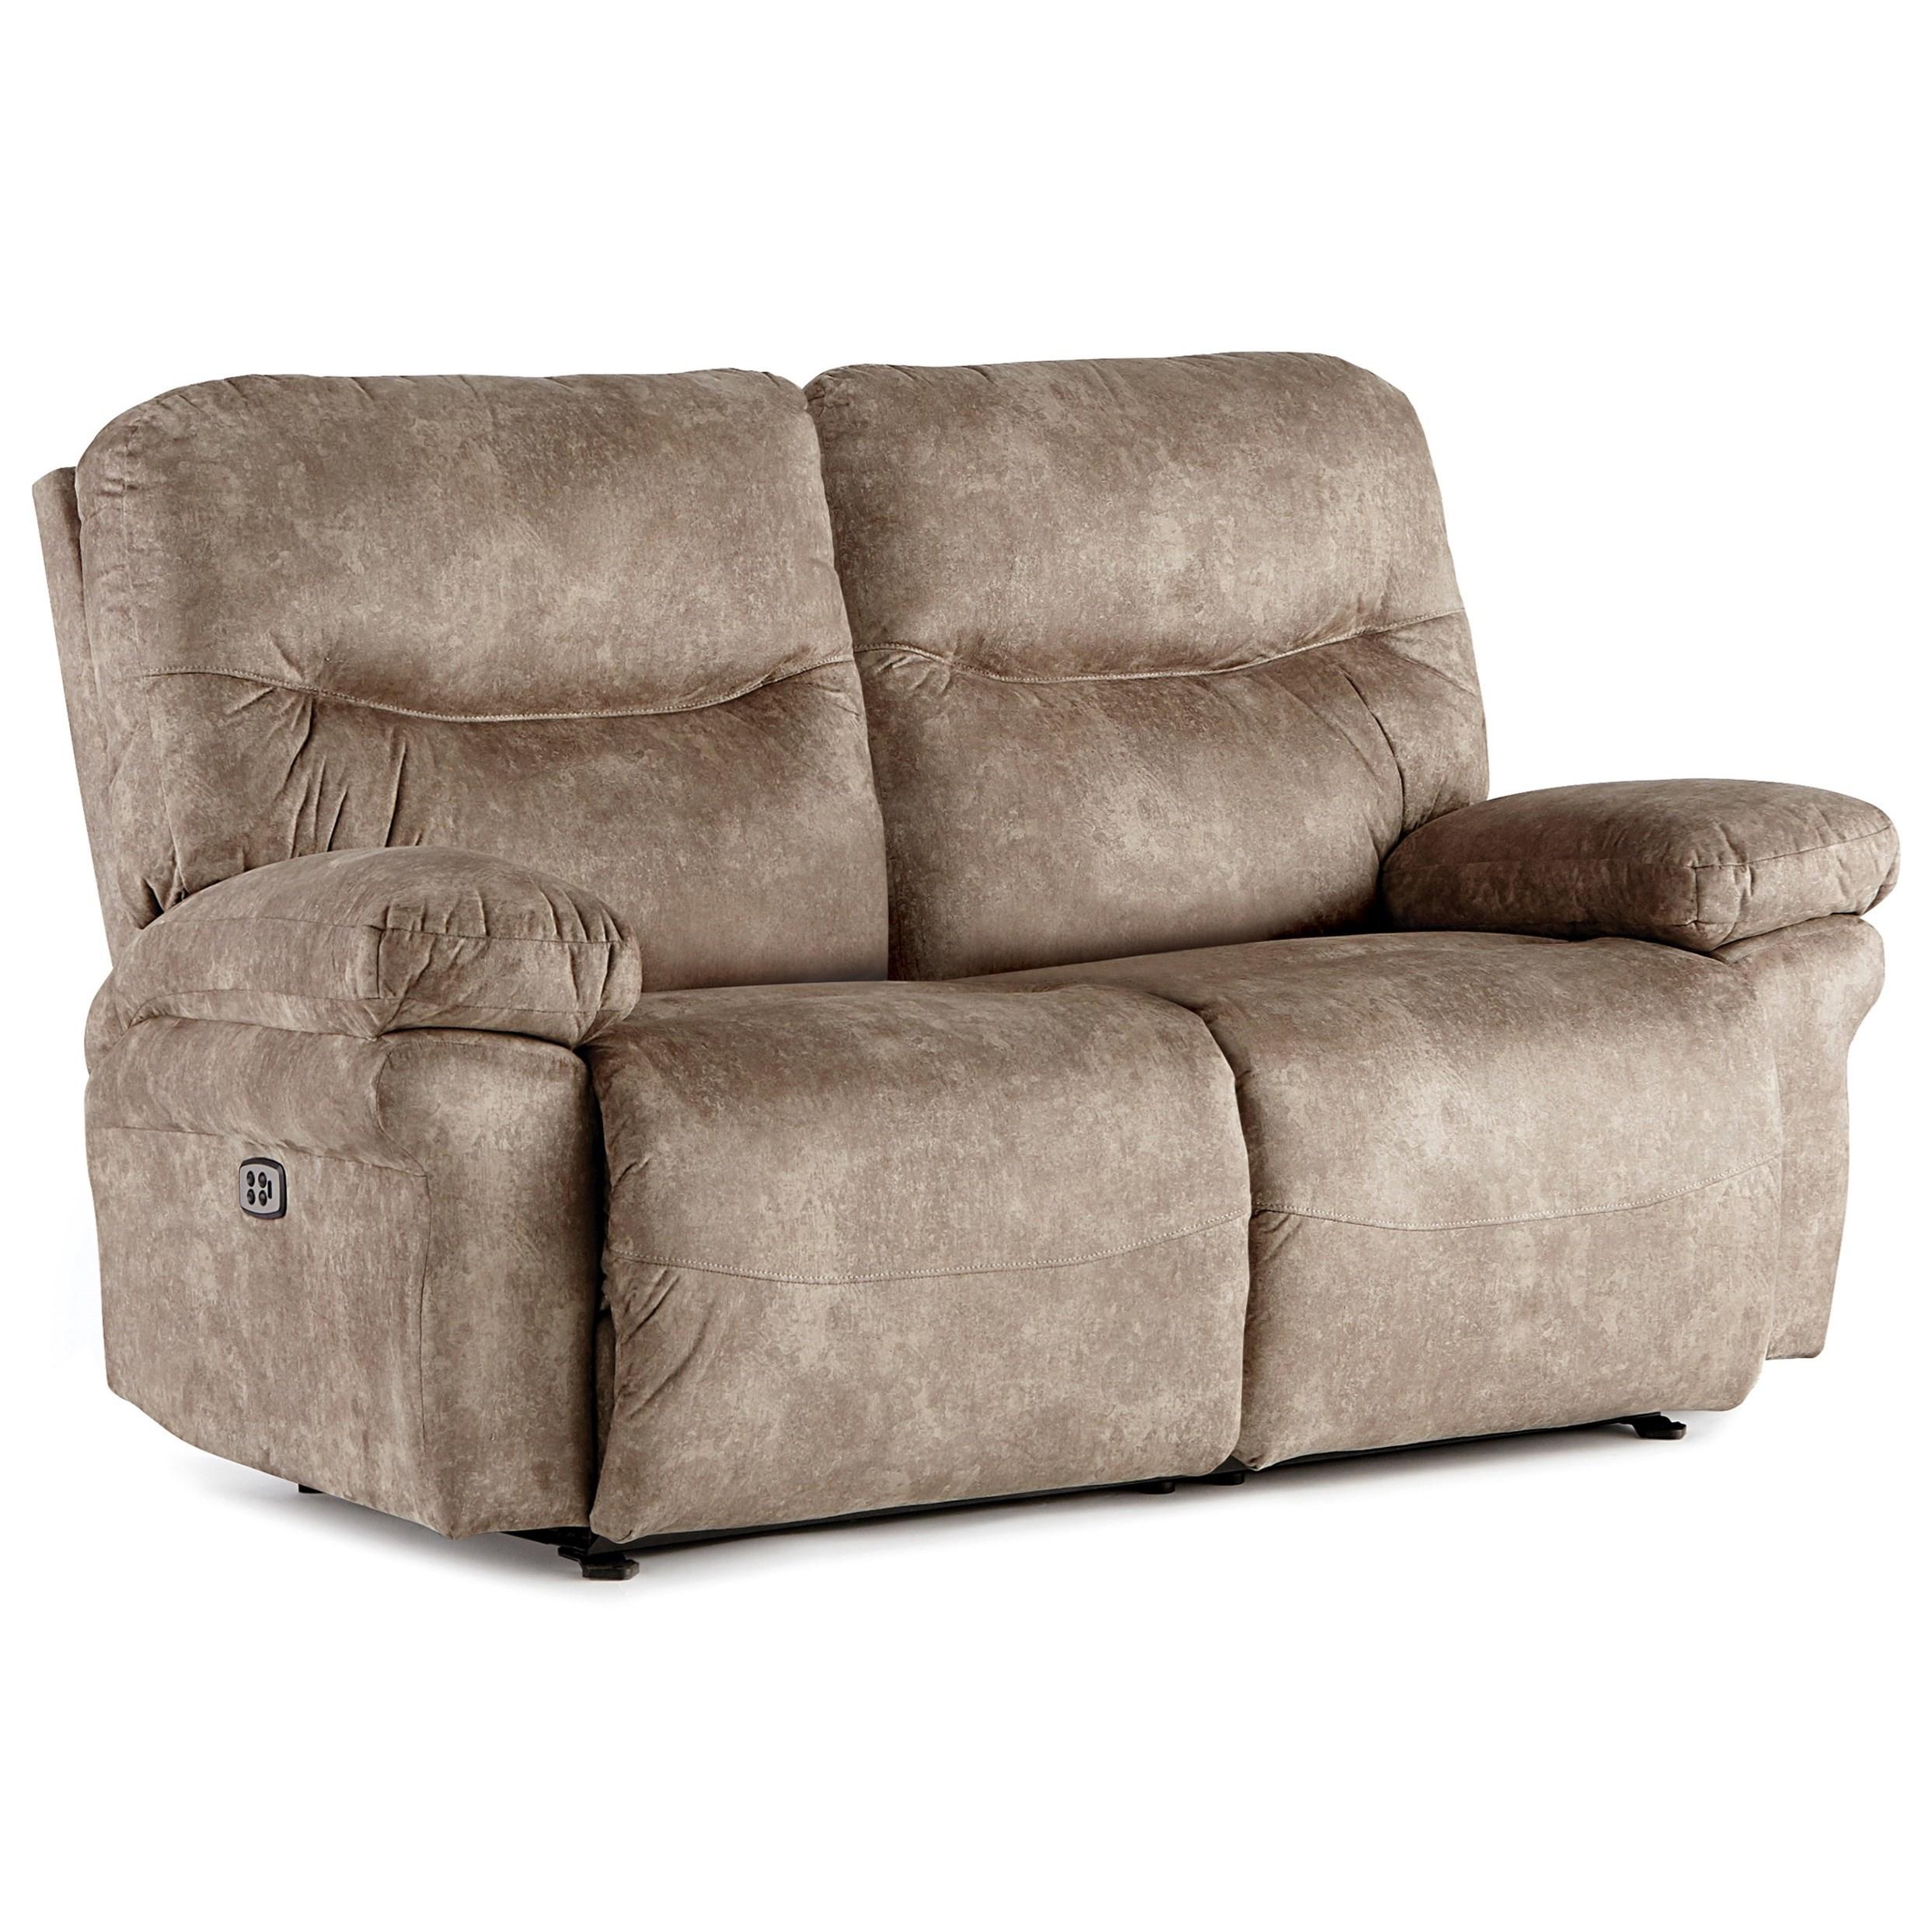 Leya Power Space Saver Loveseat w/ Tilt Headrest by Best Home Furnishings at Baer's Furniture